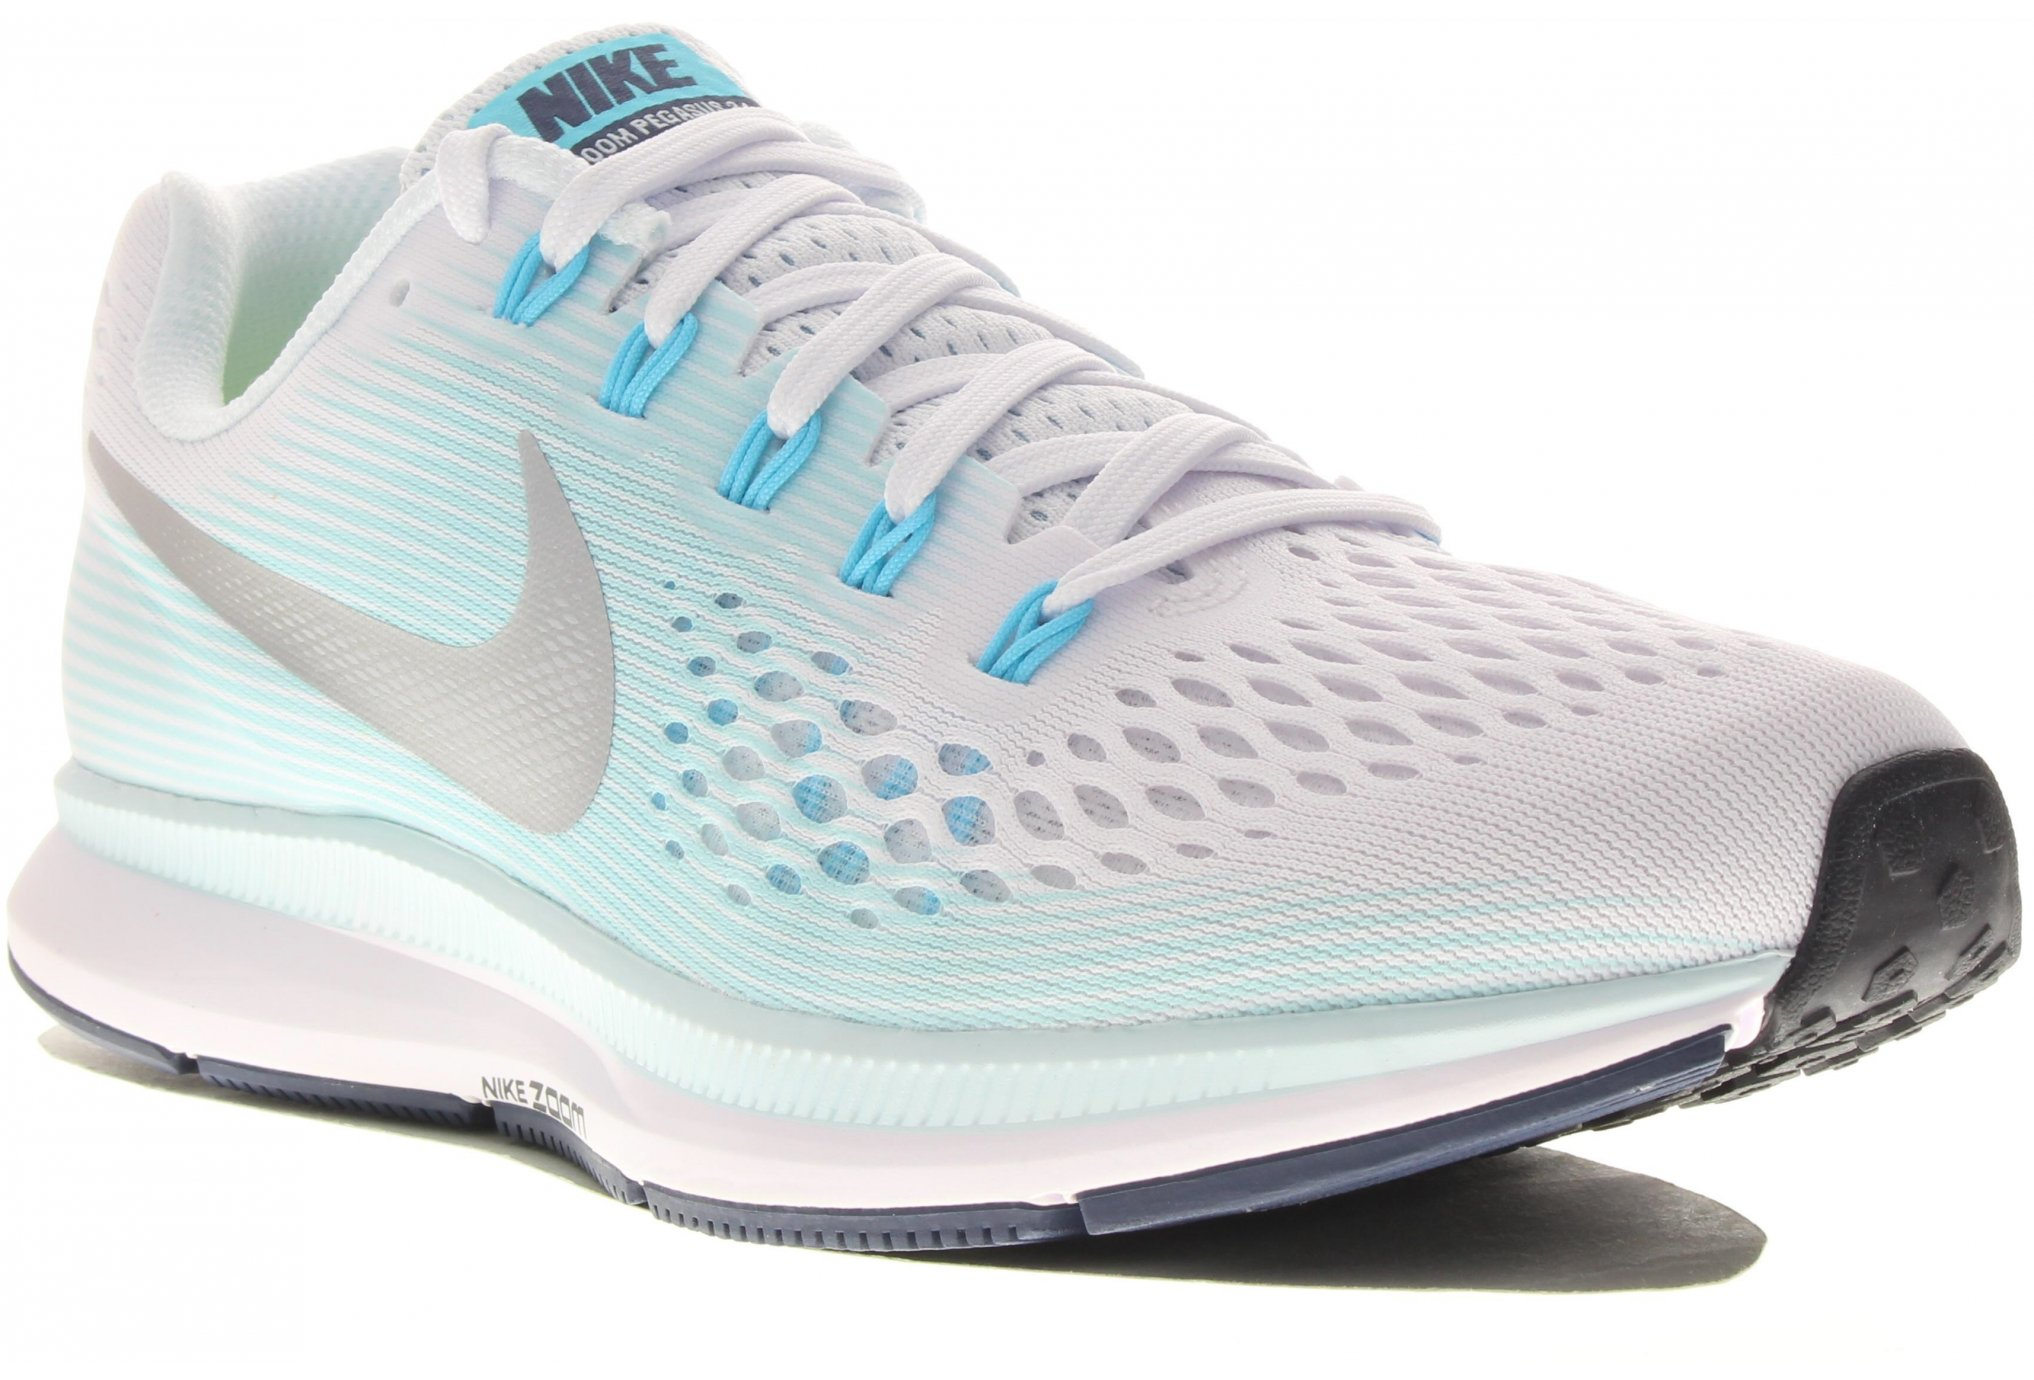 chaussures de séparation bee92 e2585 Resathlon - Nike Air Zoom Pegasus 34 W Chaussures running femme